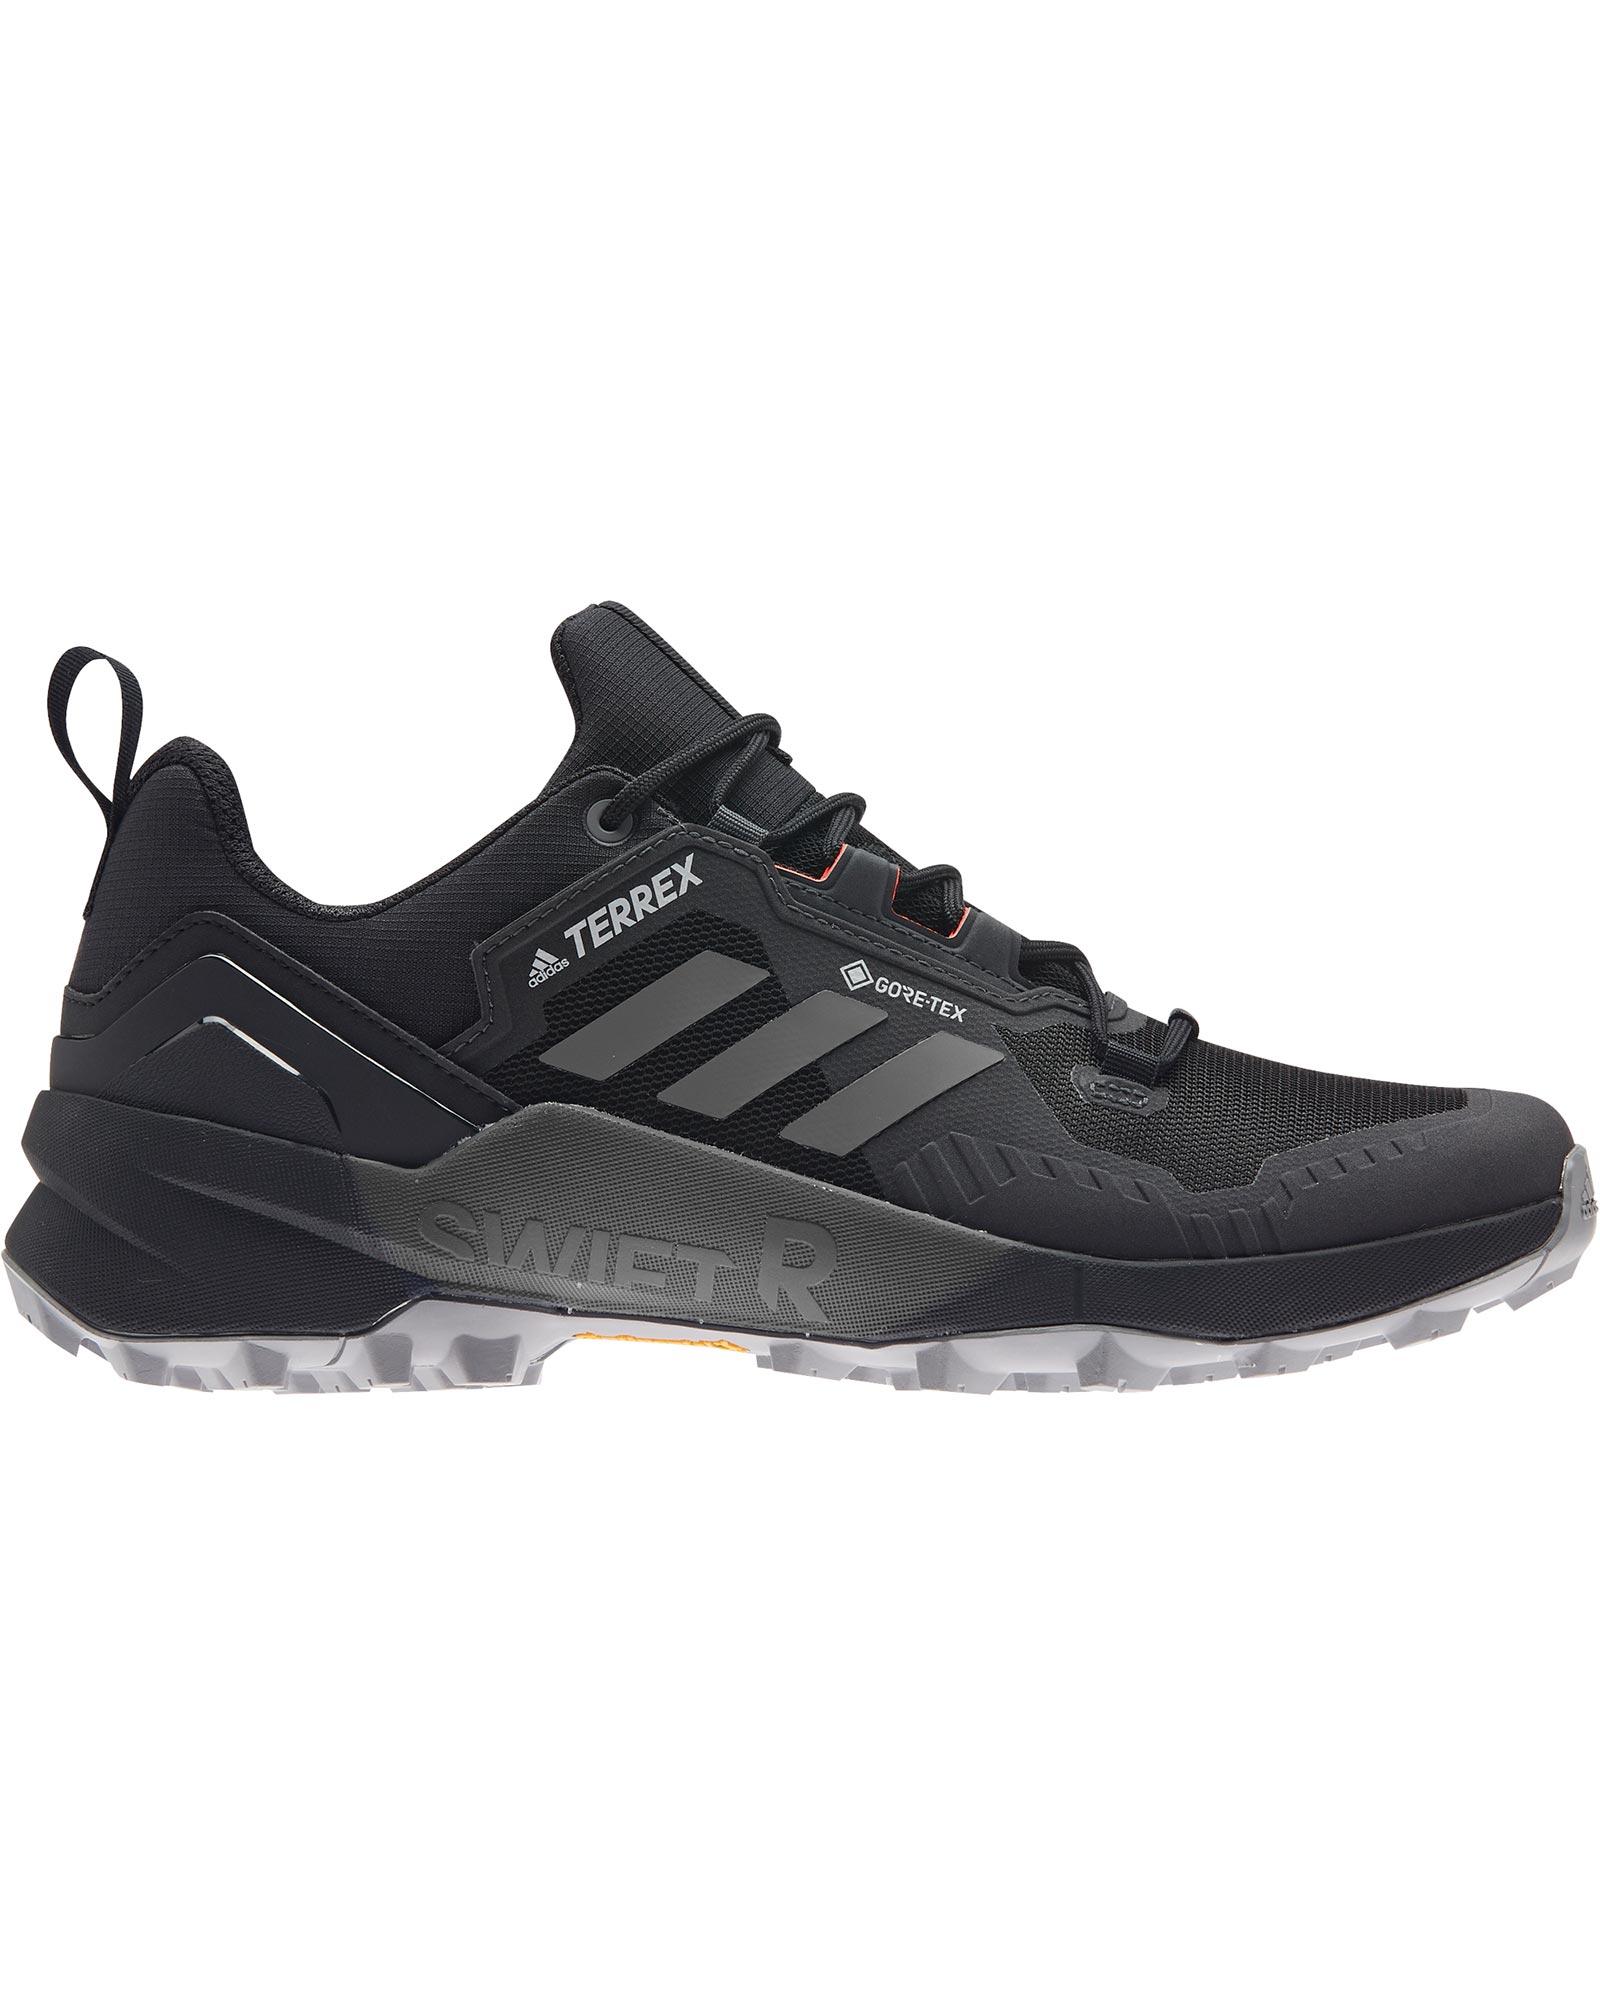 Adidas Terrex Swift R3 GORE-TEX Men's Shoes 0